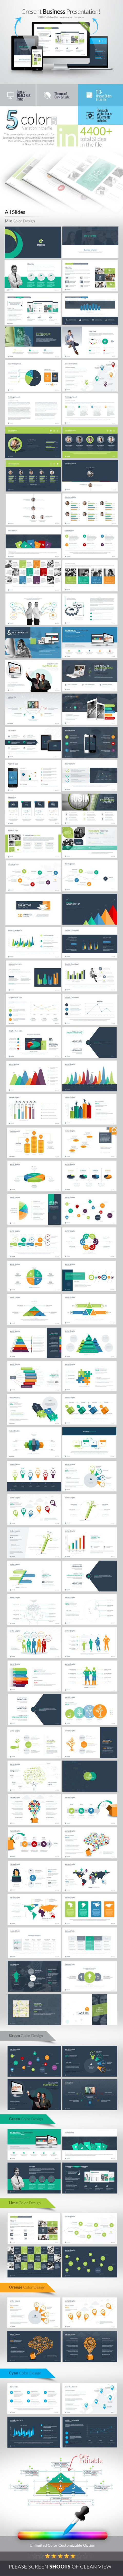 Cresent_Multipurpose Development Powerpoint - Business PowerPoint Templates